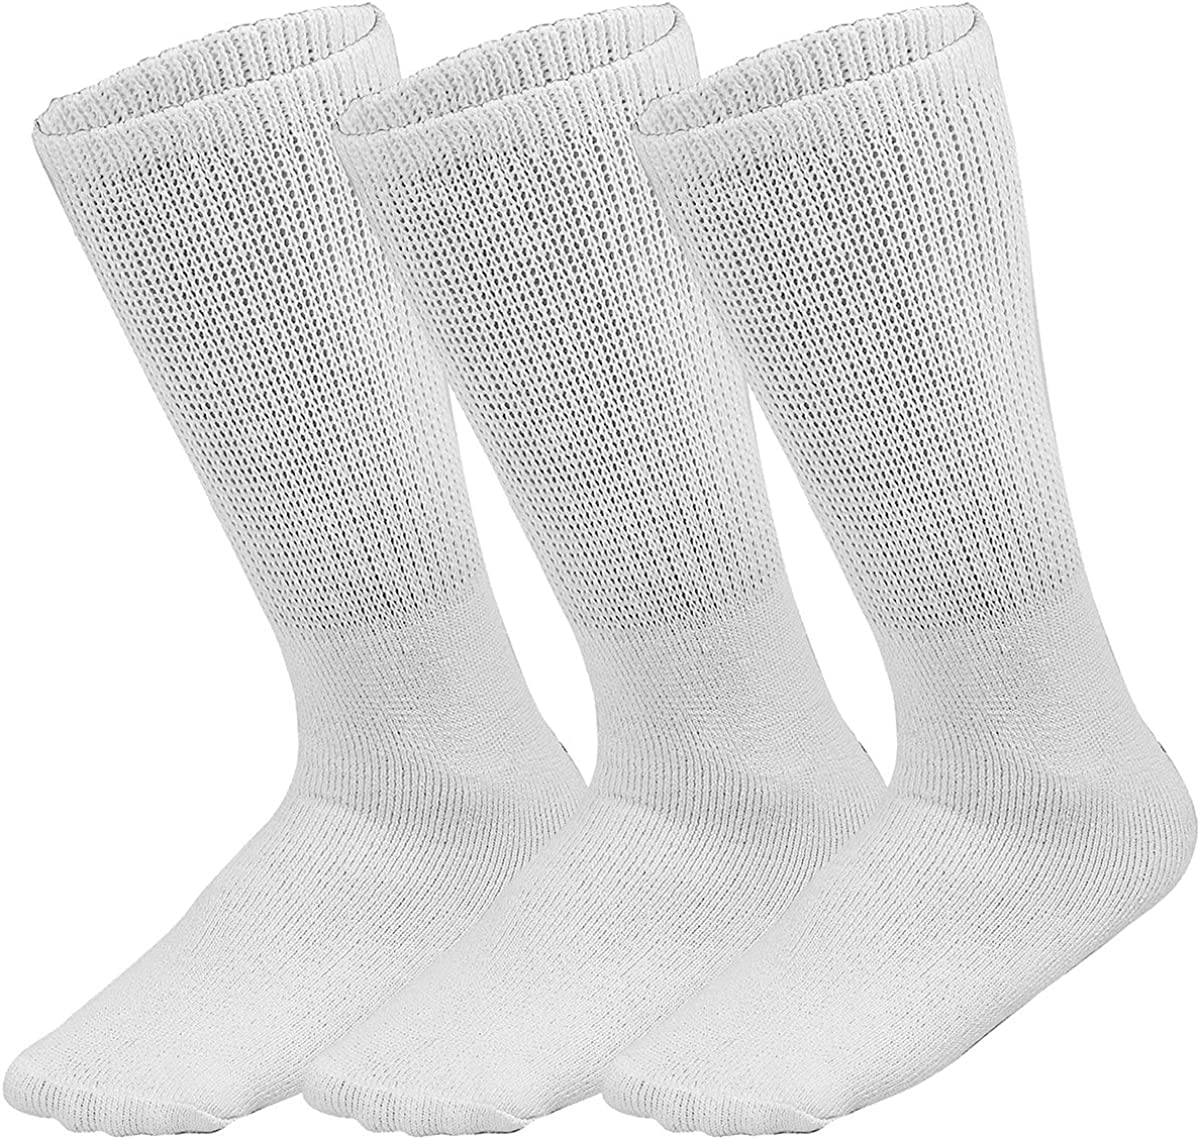 Falari 3-Pack Physicians Approved Diabetic Dedication Super sale Loose Crew Socks Fit